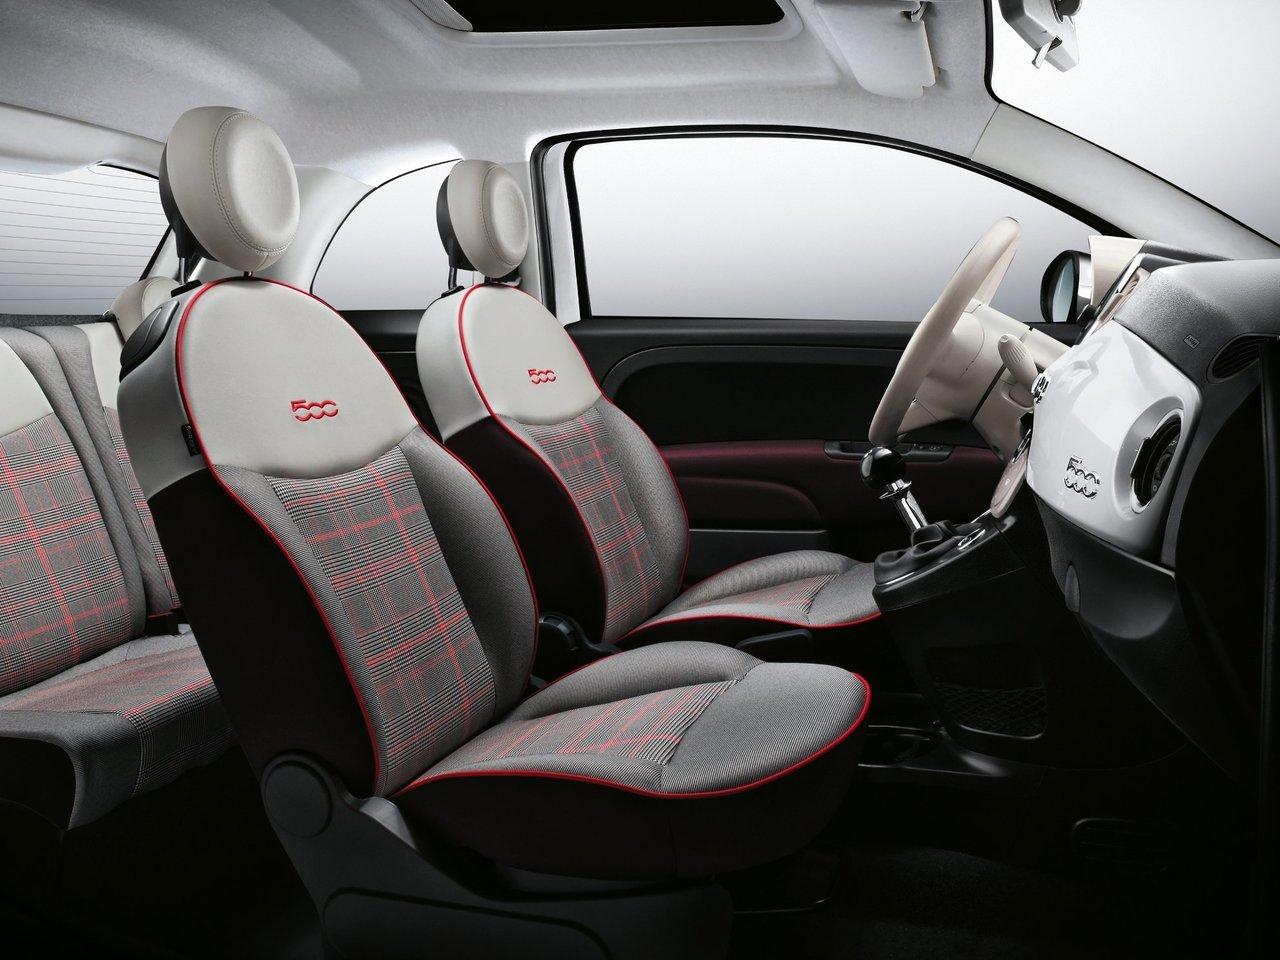 Снимки: Fiat 500 New